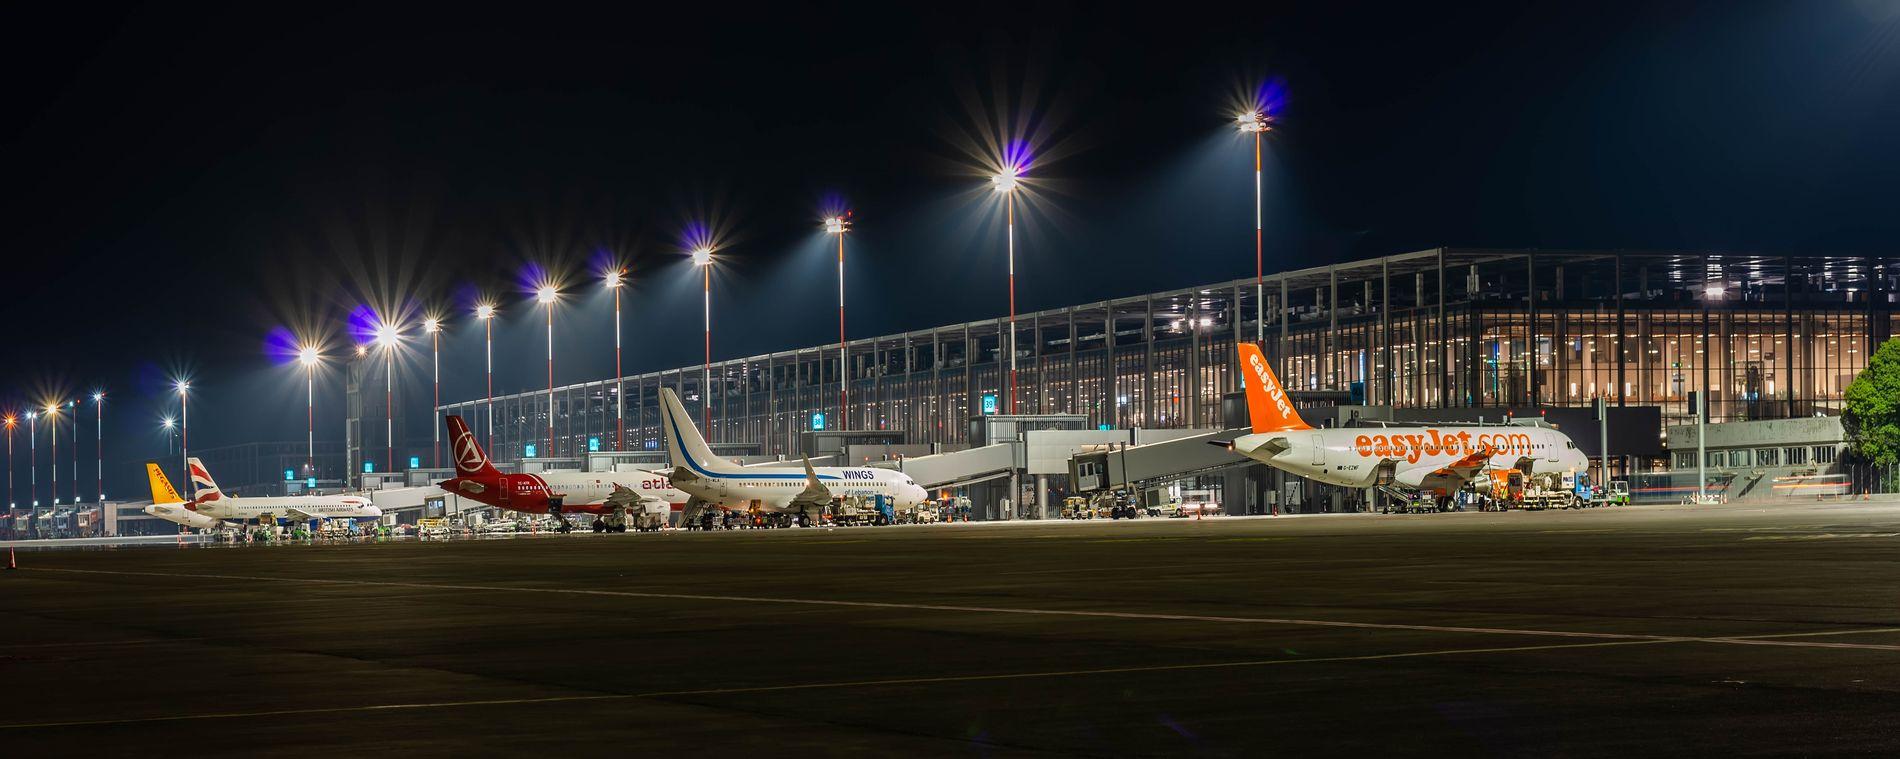 aeroport dalaman, aviakompanii